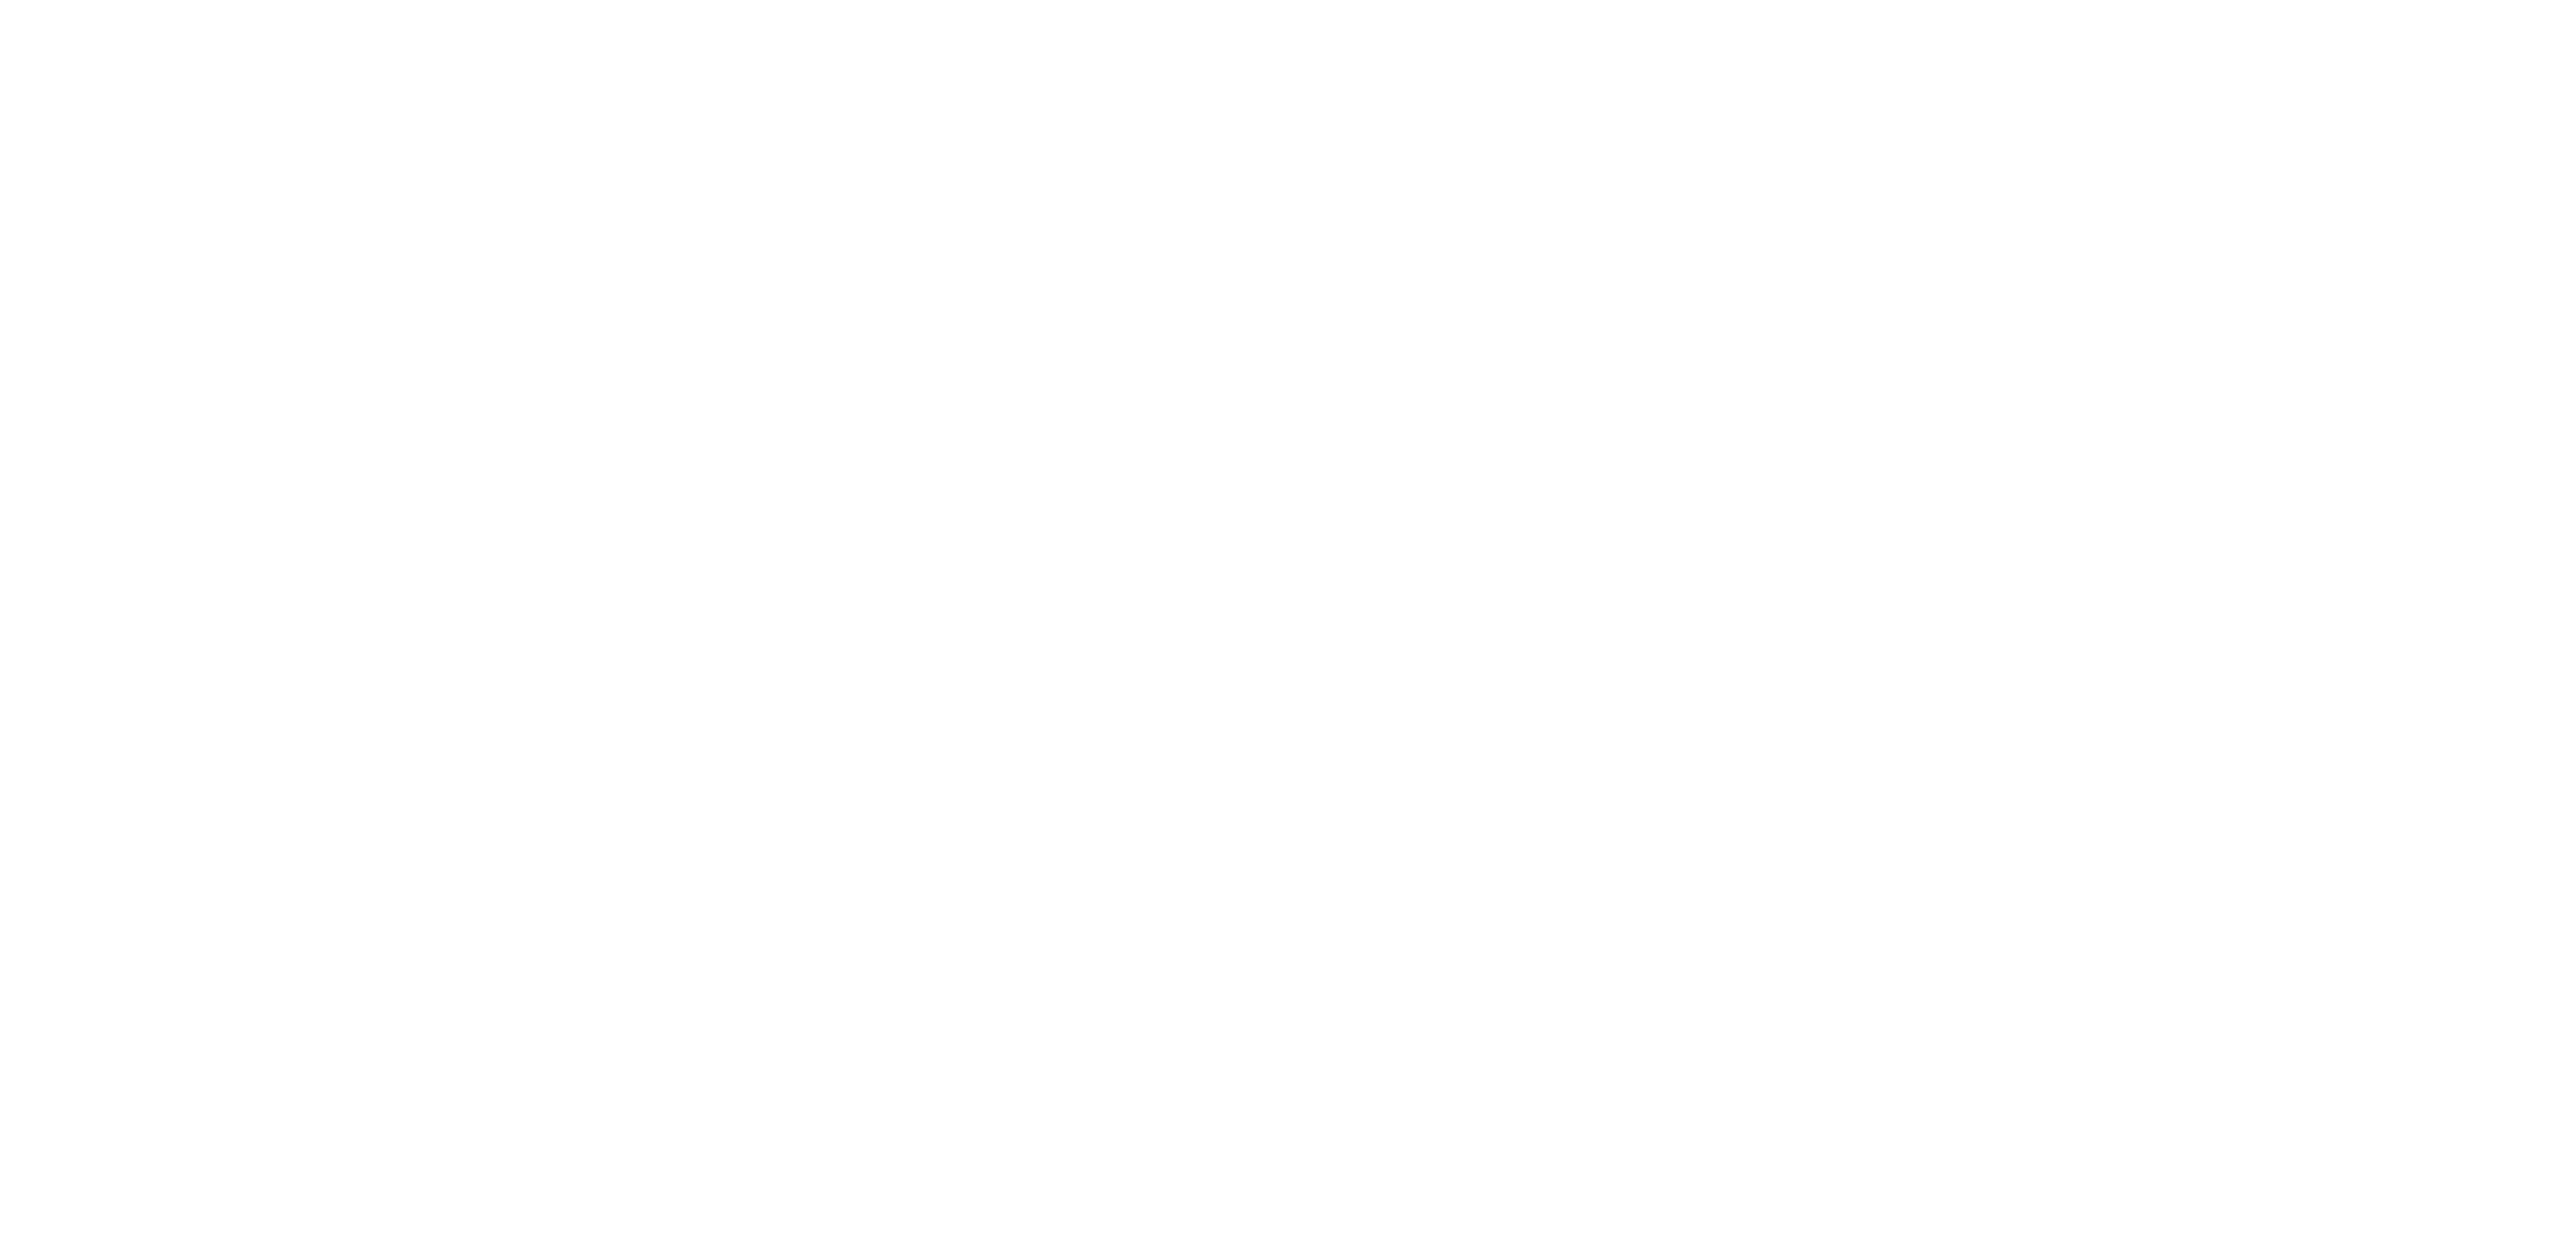 DIR-logo_Name_White